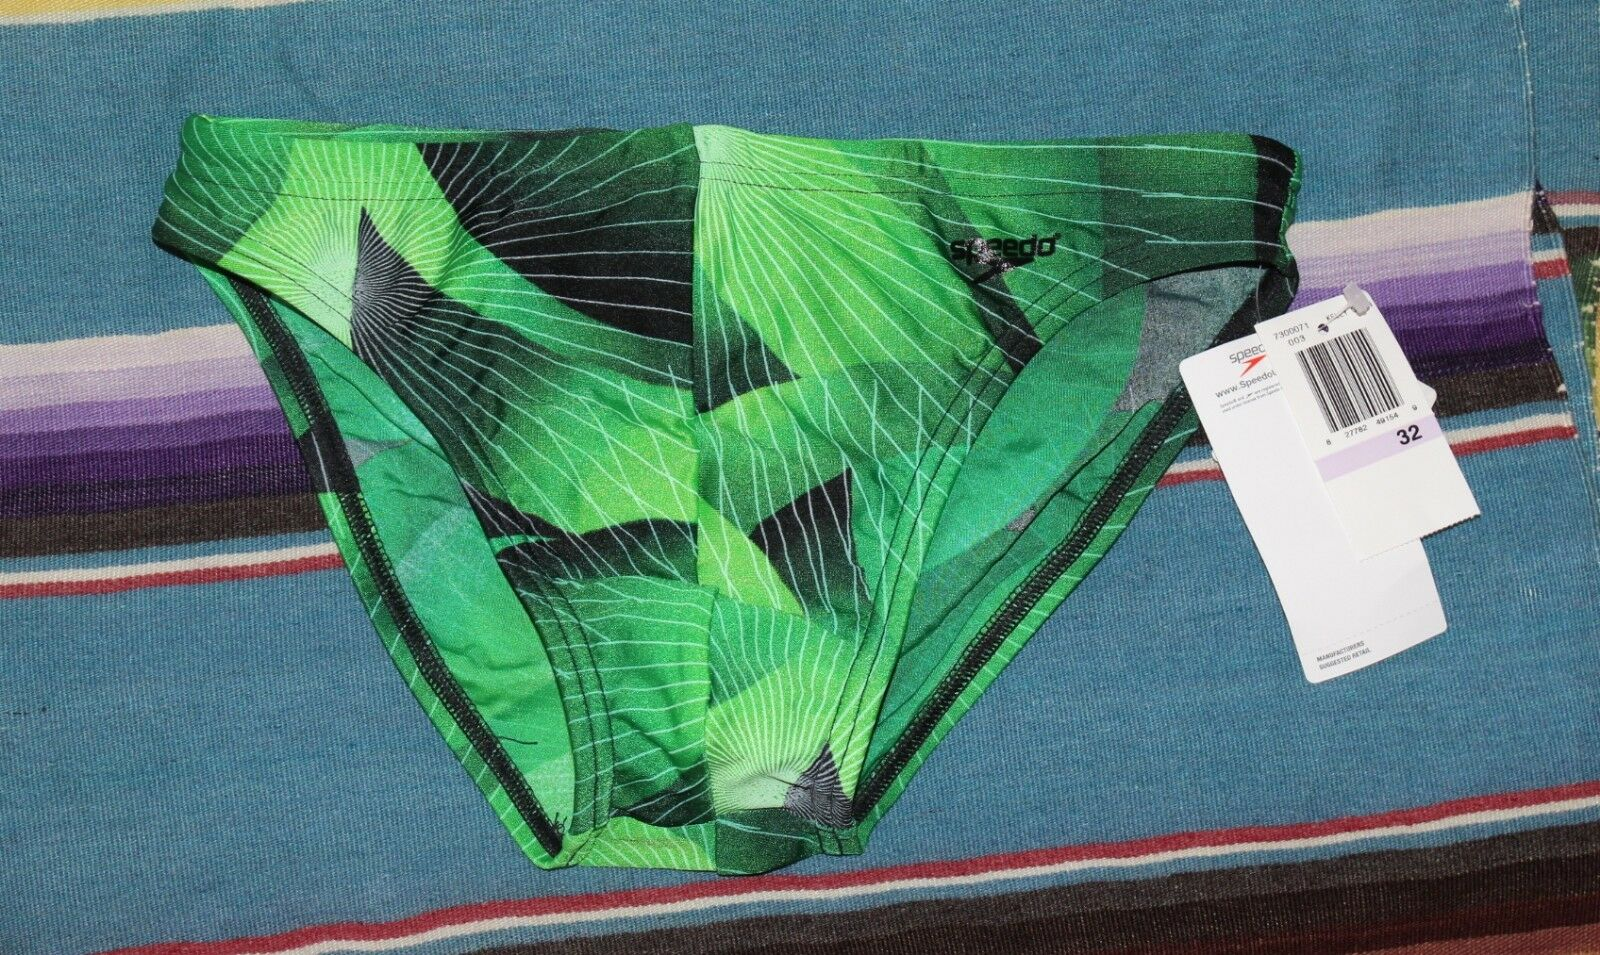 NEW Speedo Men's -Sz 32 M 2000s Funky Green 1.25  RACING Swim Briefs Bikini